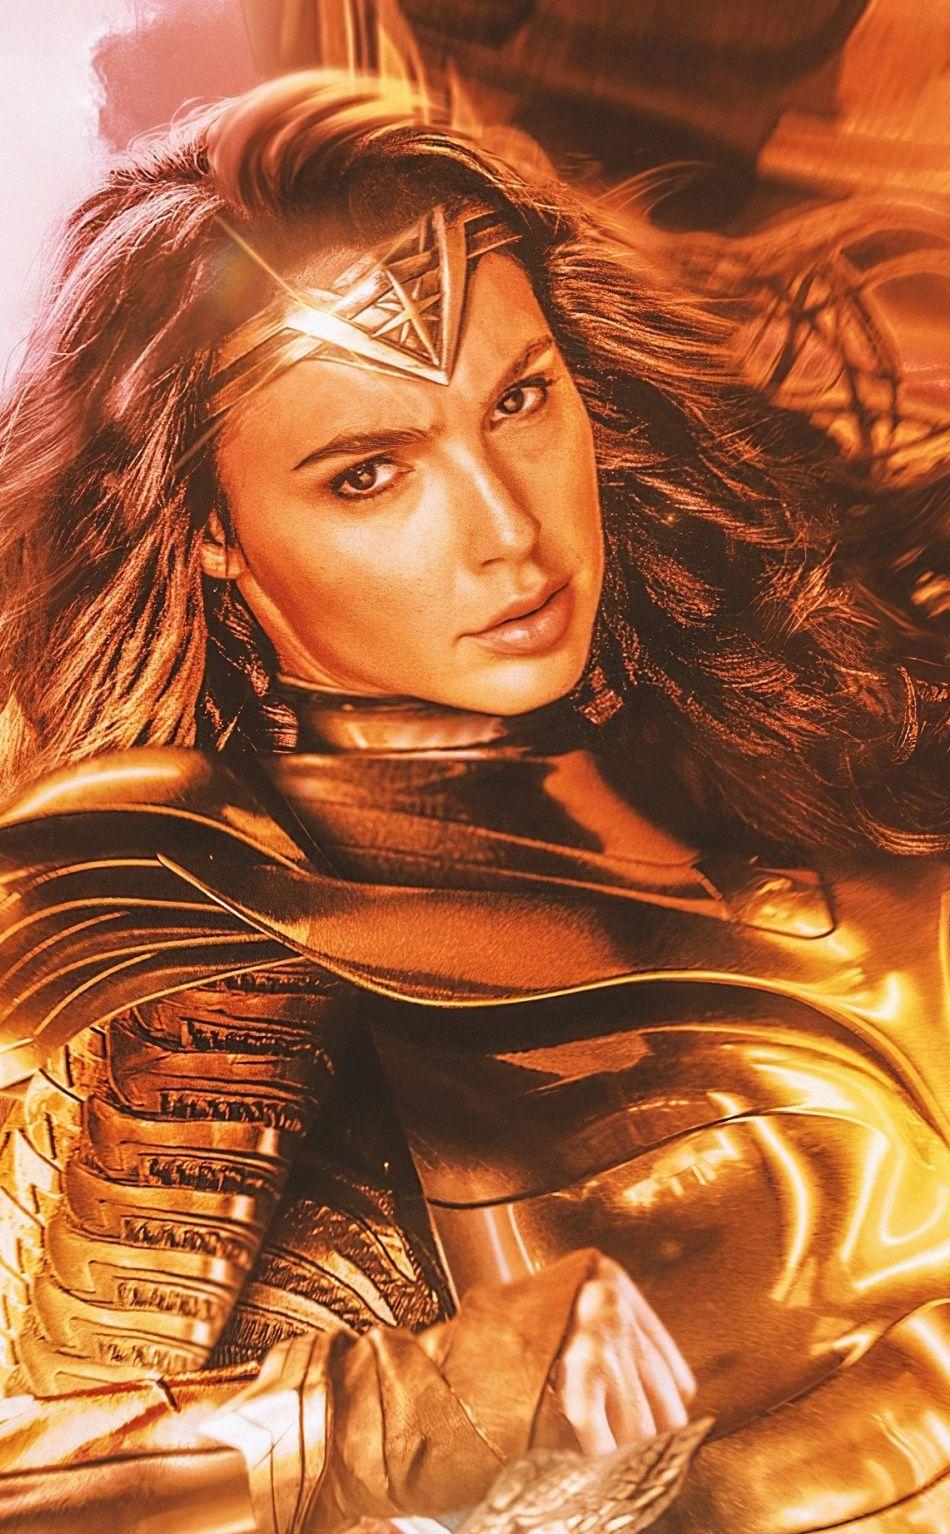 Free Download 950x1534 Wonder Woman 1984 Golden Wings 2020 Movie